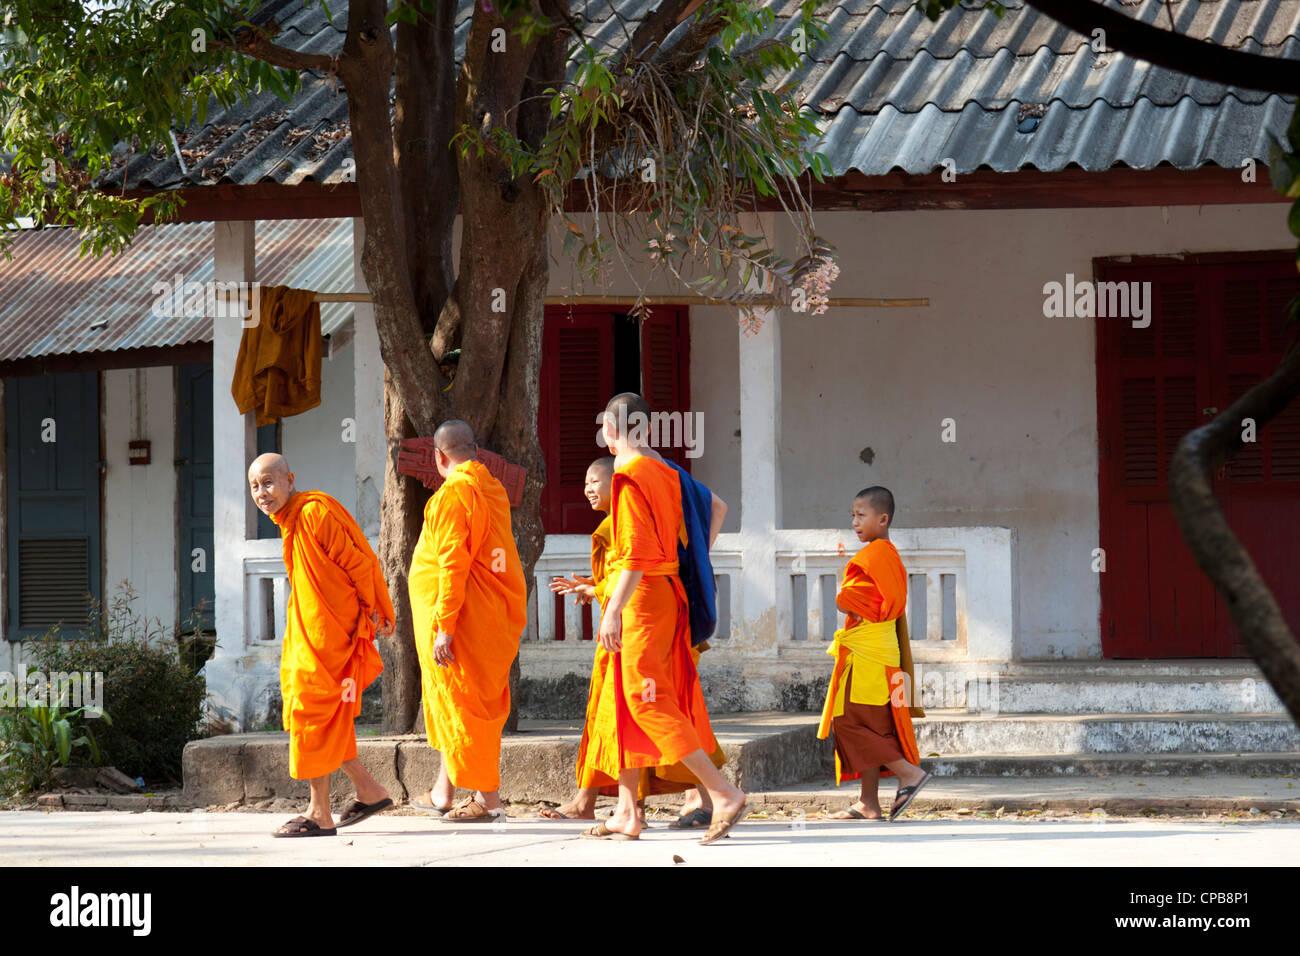 A funny shot of monks of all ages moving in group, at Luang Prabang (Laos). Une amusante photo de moines se déplaçant - Stock Image